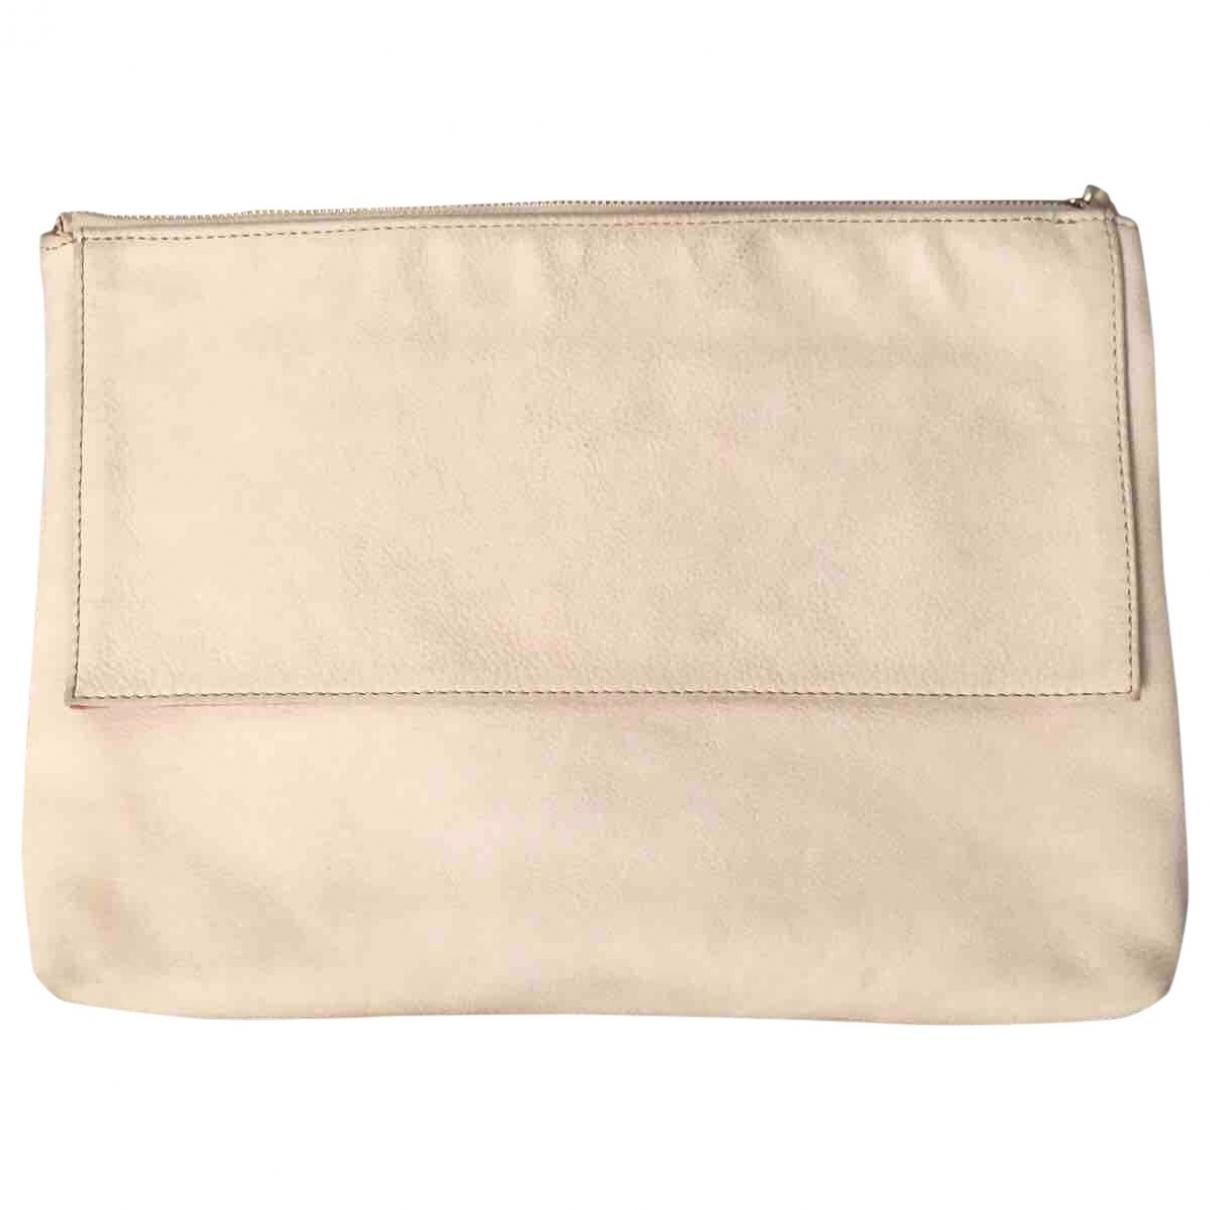 Zara \N Pink Leather handbag for Women \N